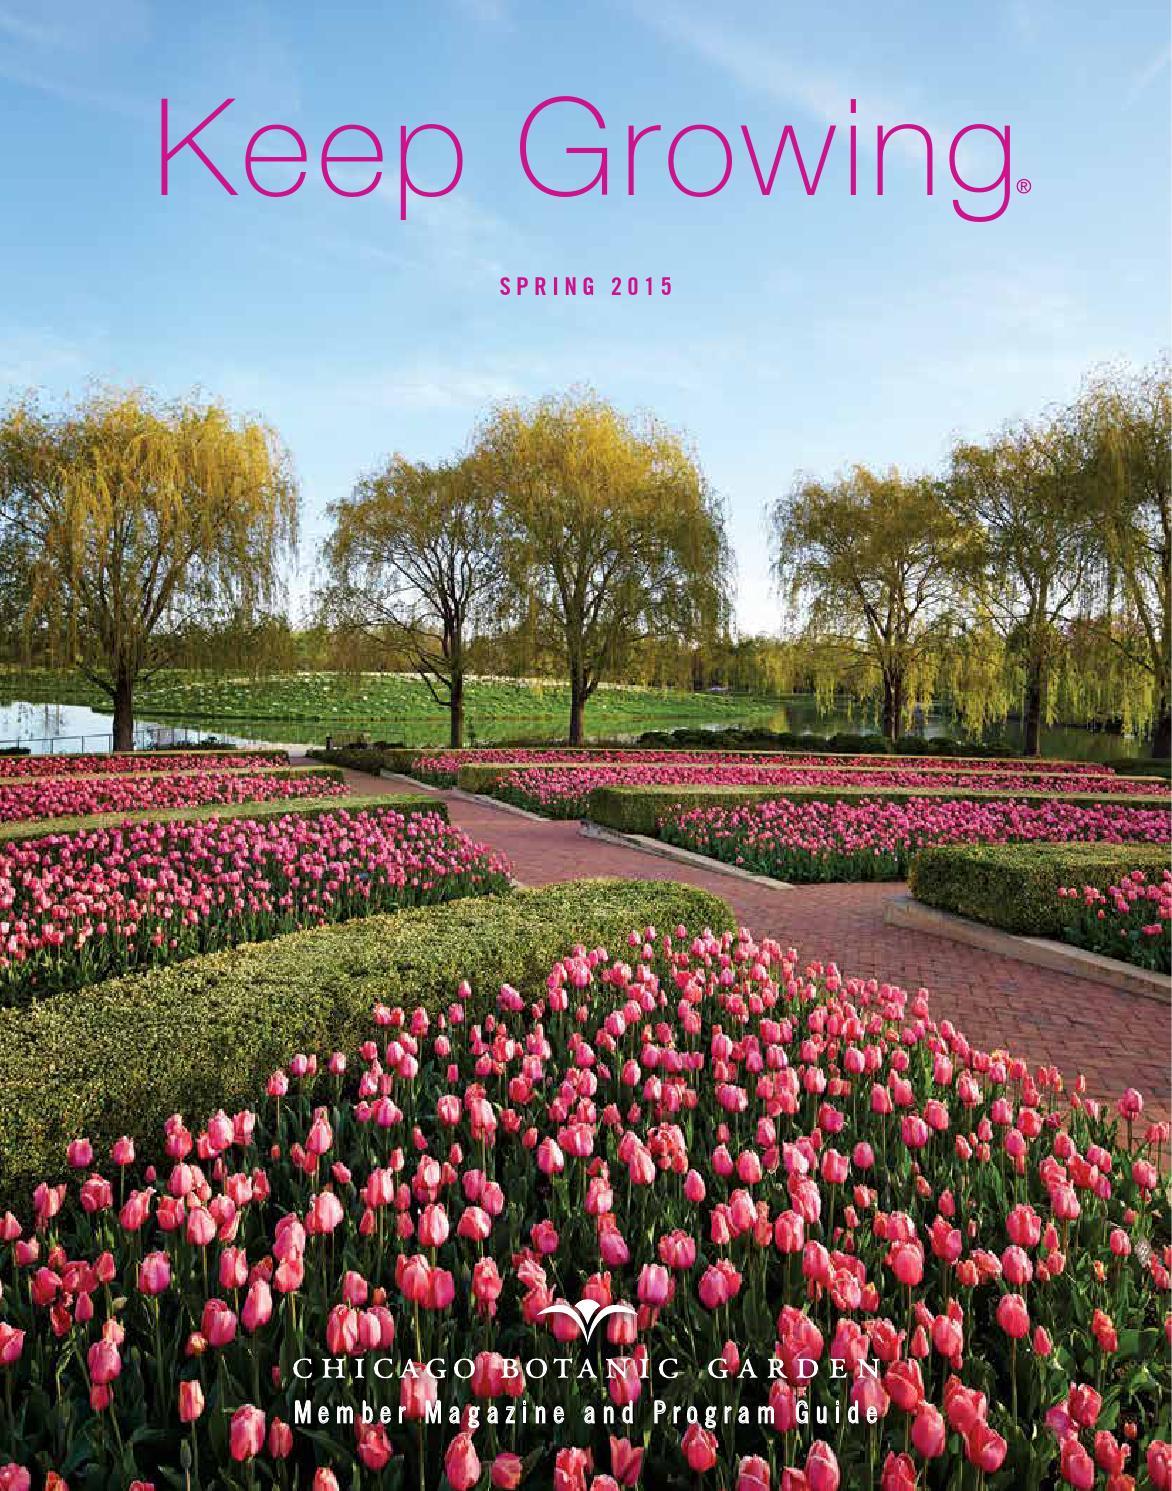 Keep growing spring 2015 by chicago botanic garden issuu for Chicago botanic garden membership